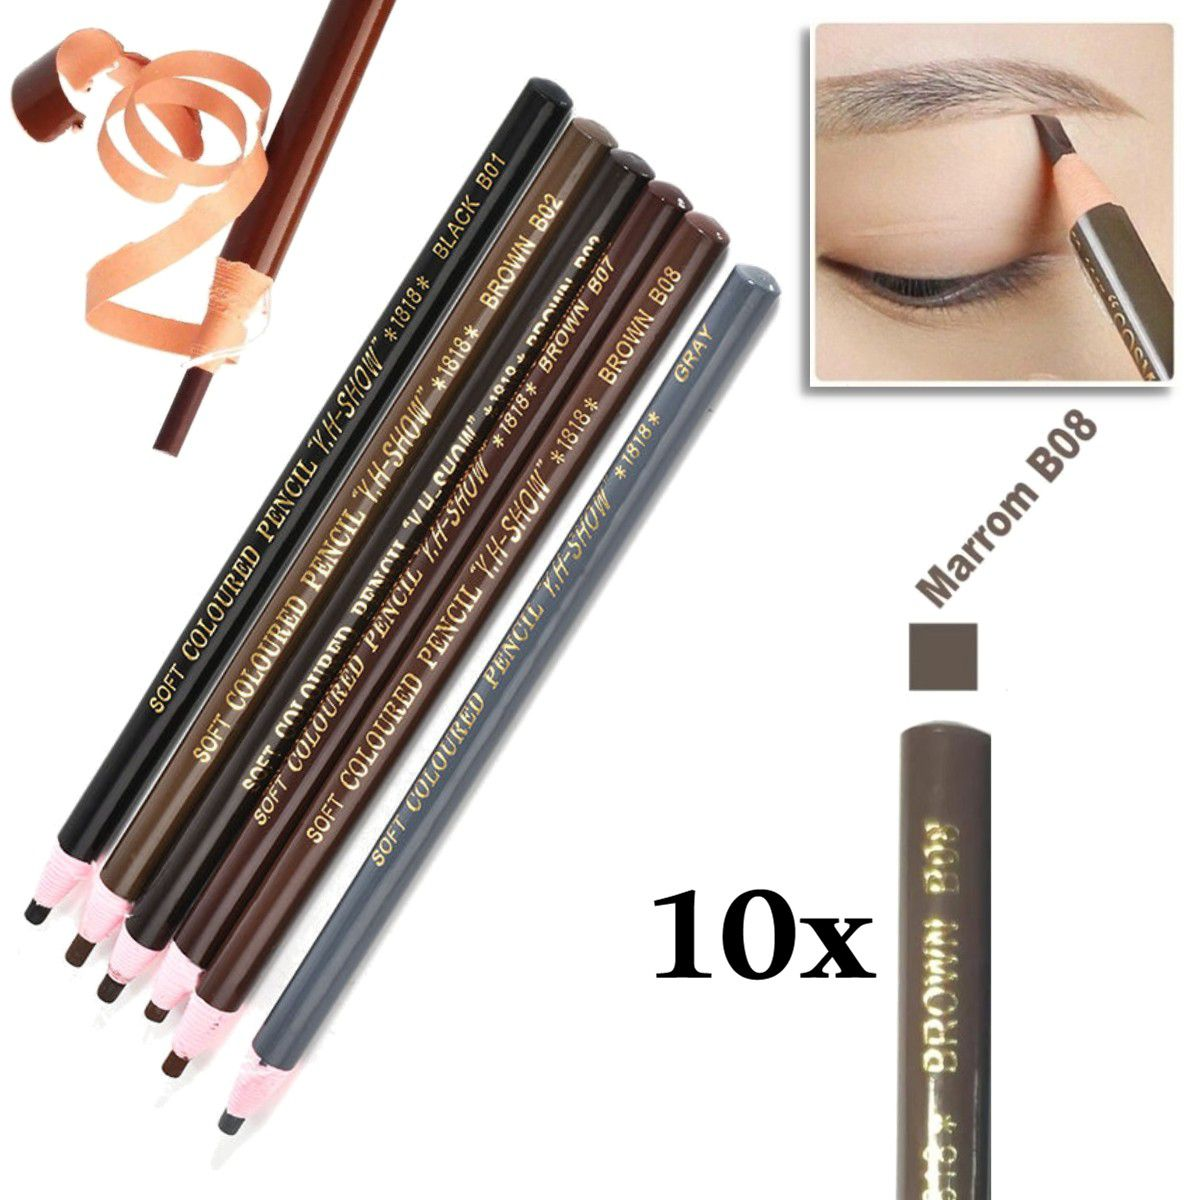 Kit 10 Lapis Dermografico Dermatografico Sobrancelhas Micropigmentação - Marrom Claro B08